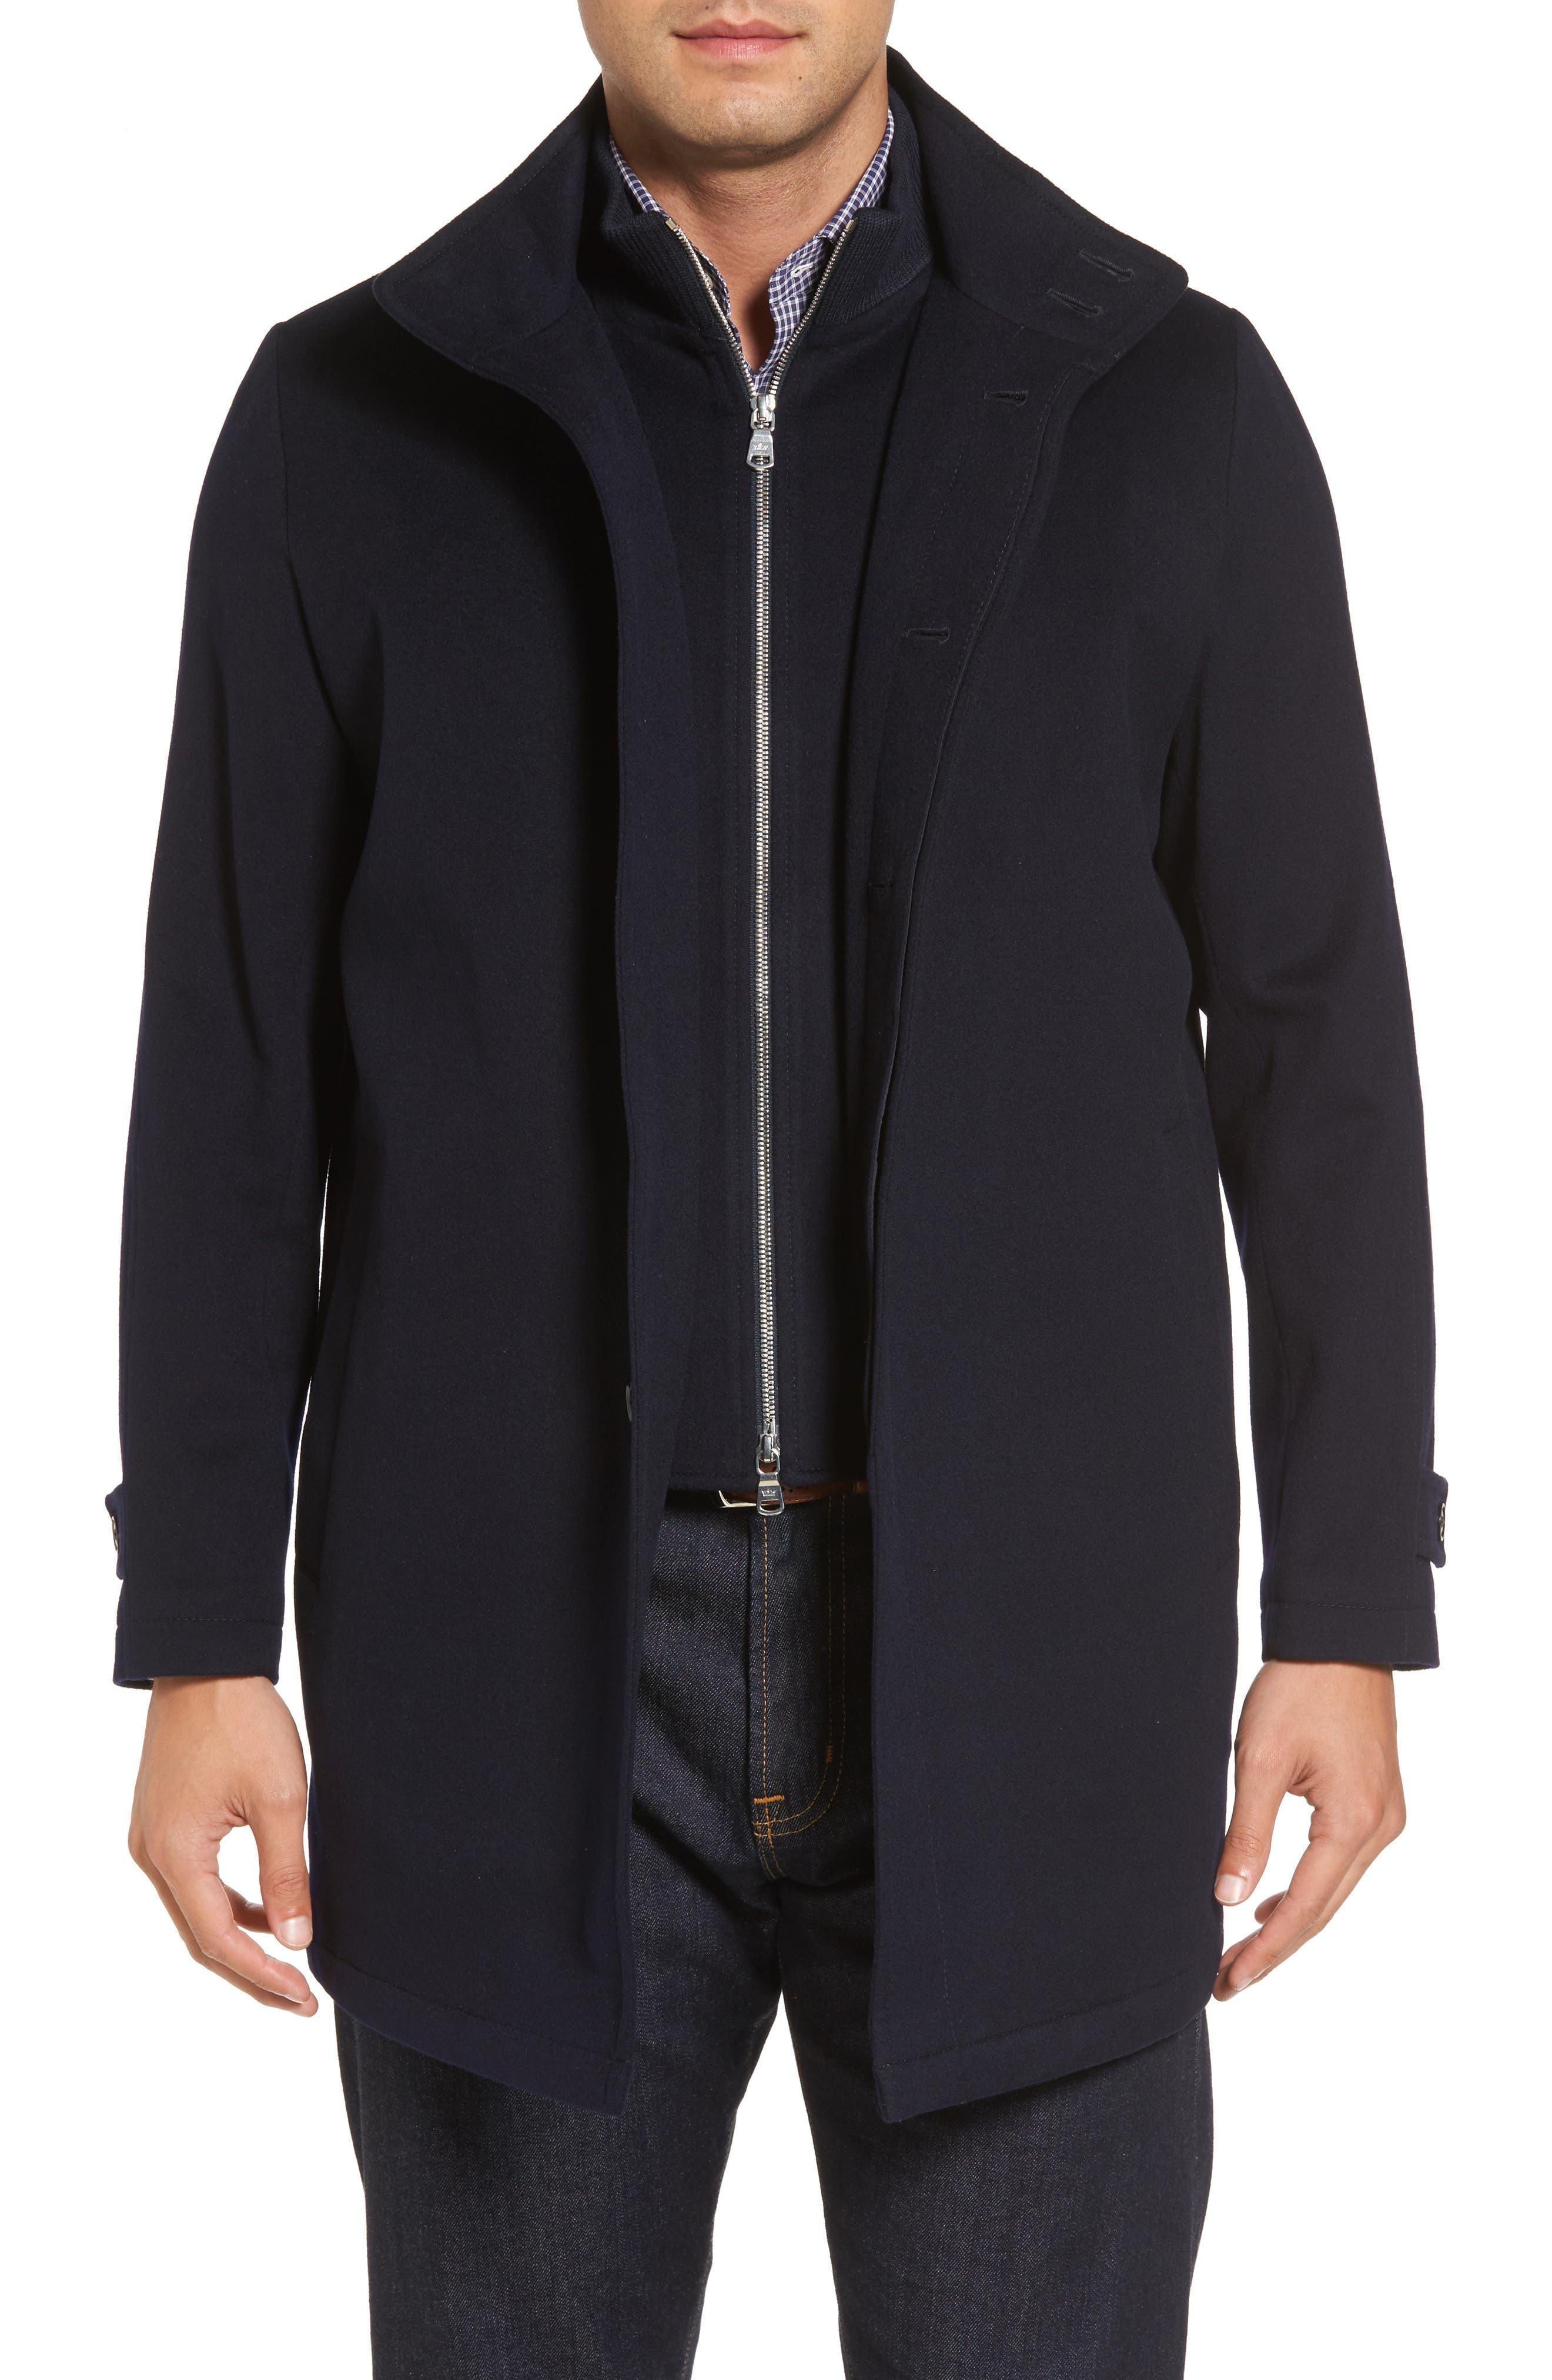 Main Image - Peter Millar Horizon Wool Overcoat